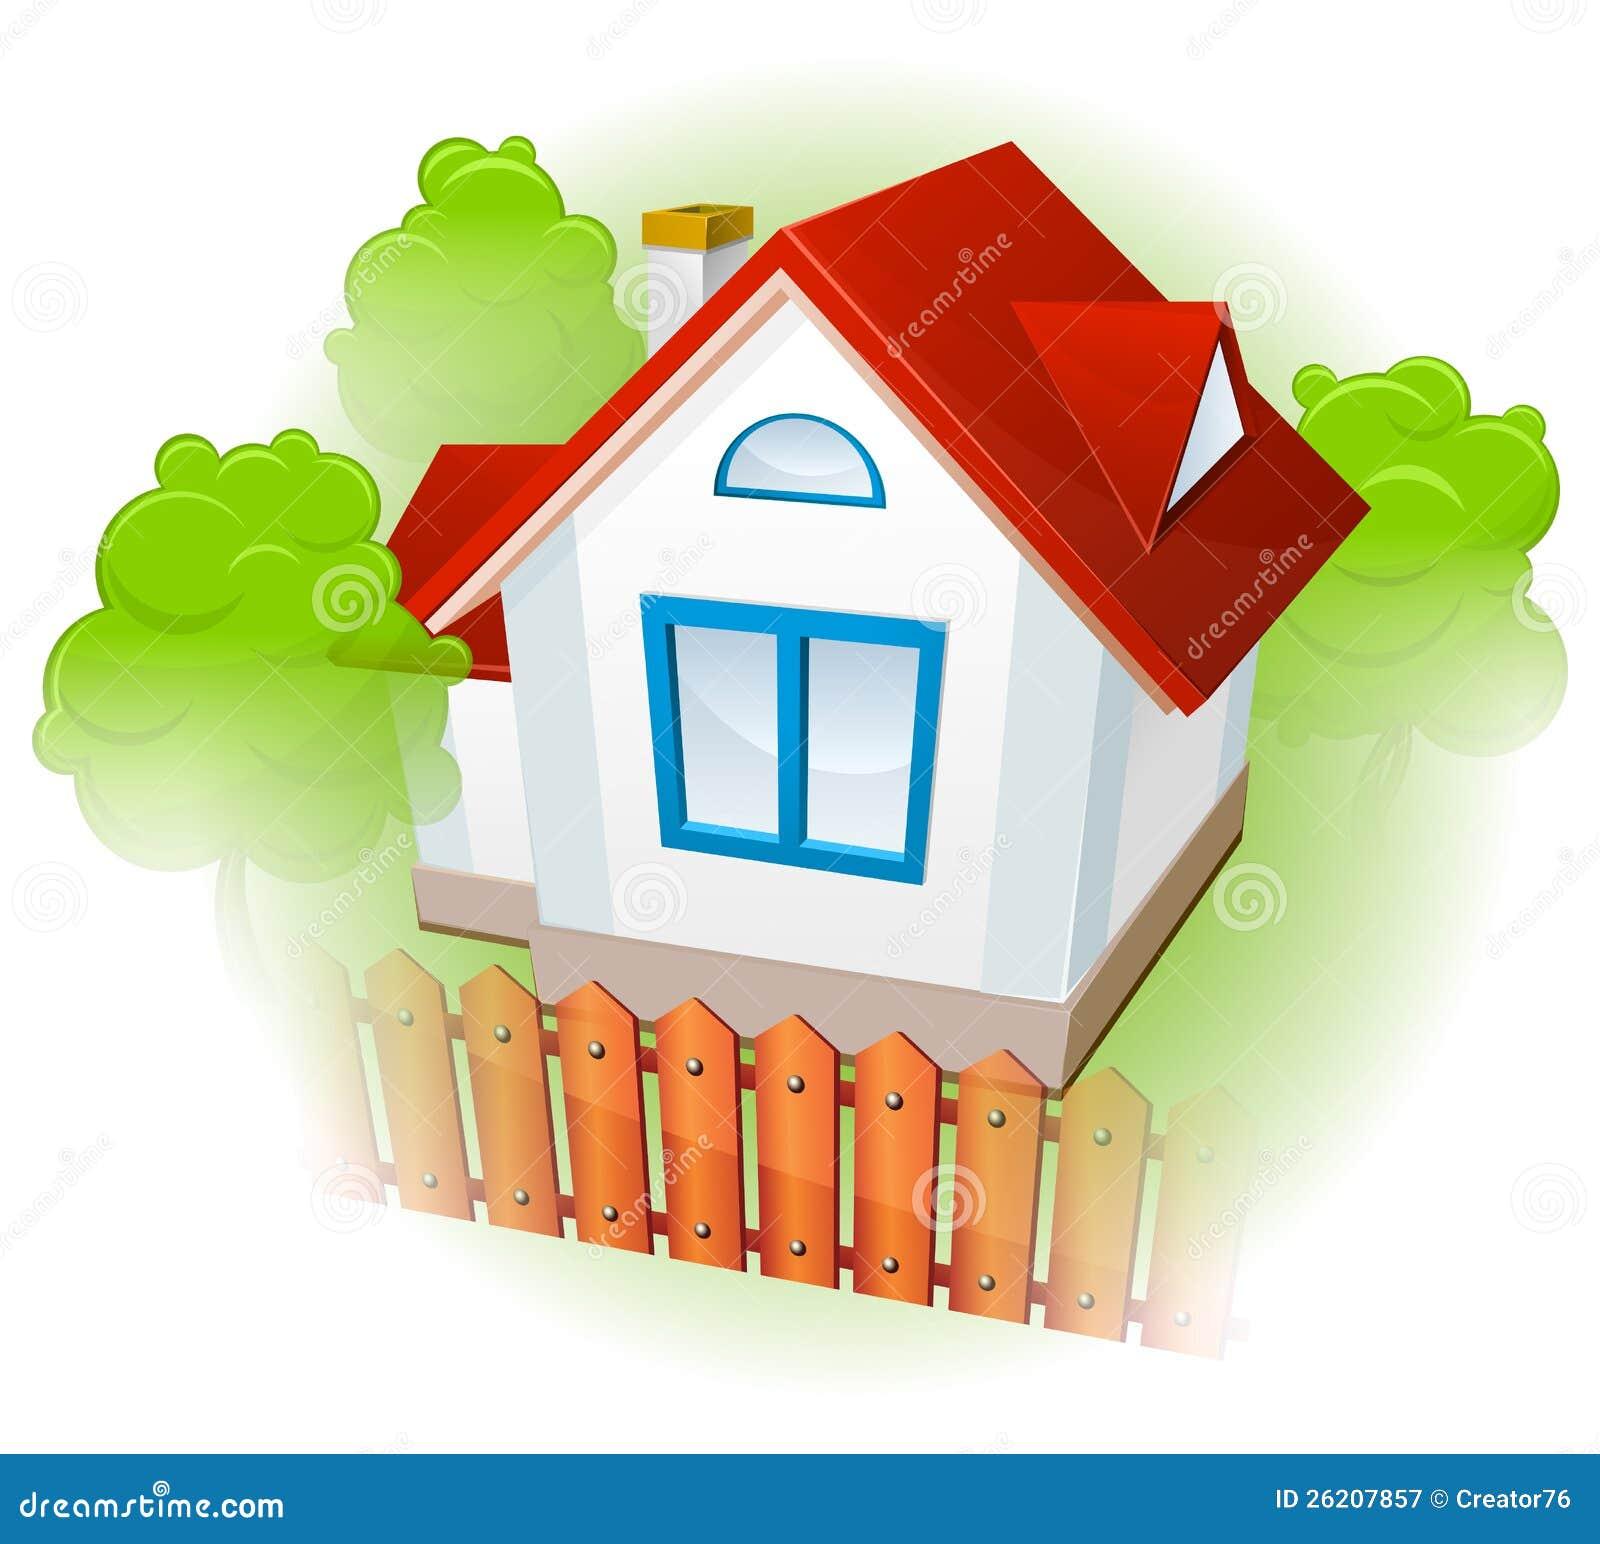 rural house with garden stock vector illustration of symbol 26207857. Black Bedroom Furniture Sets. Home Design Ideas